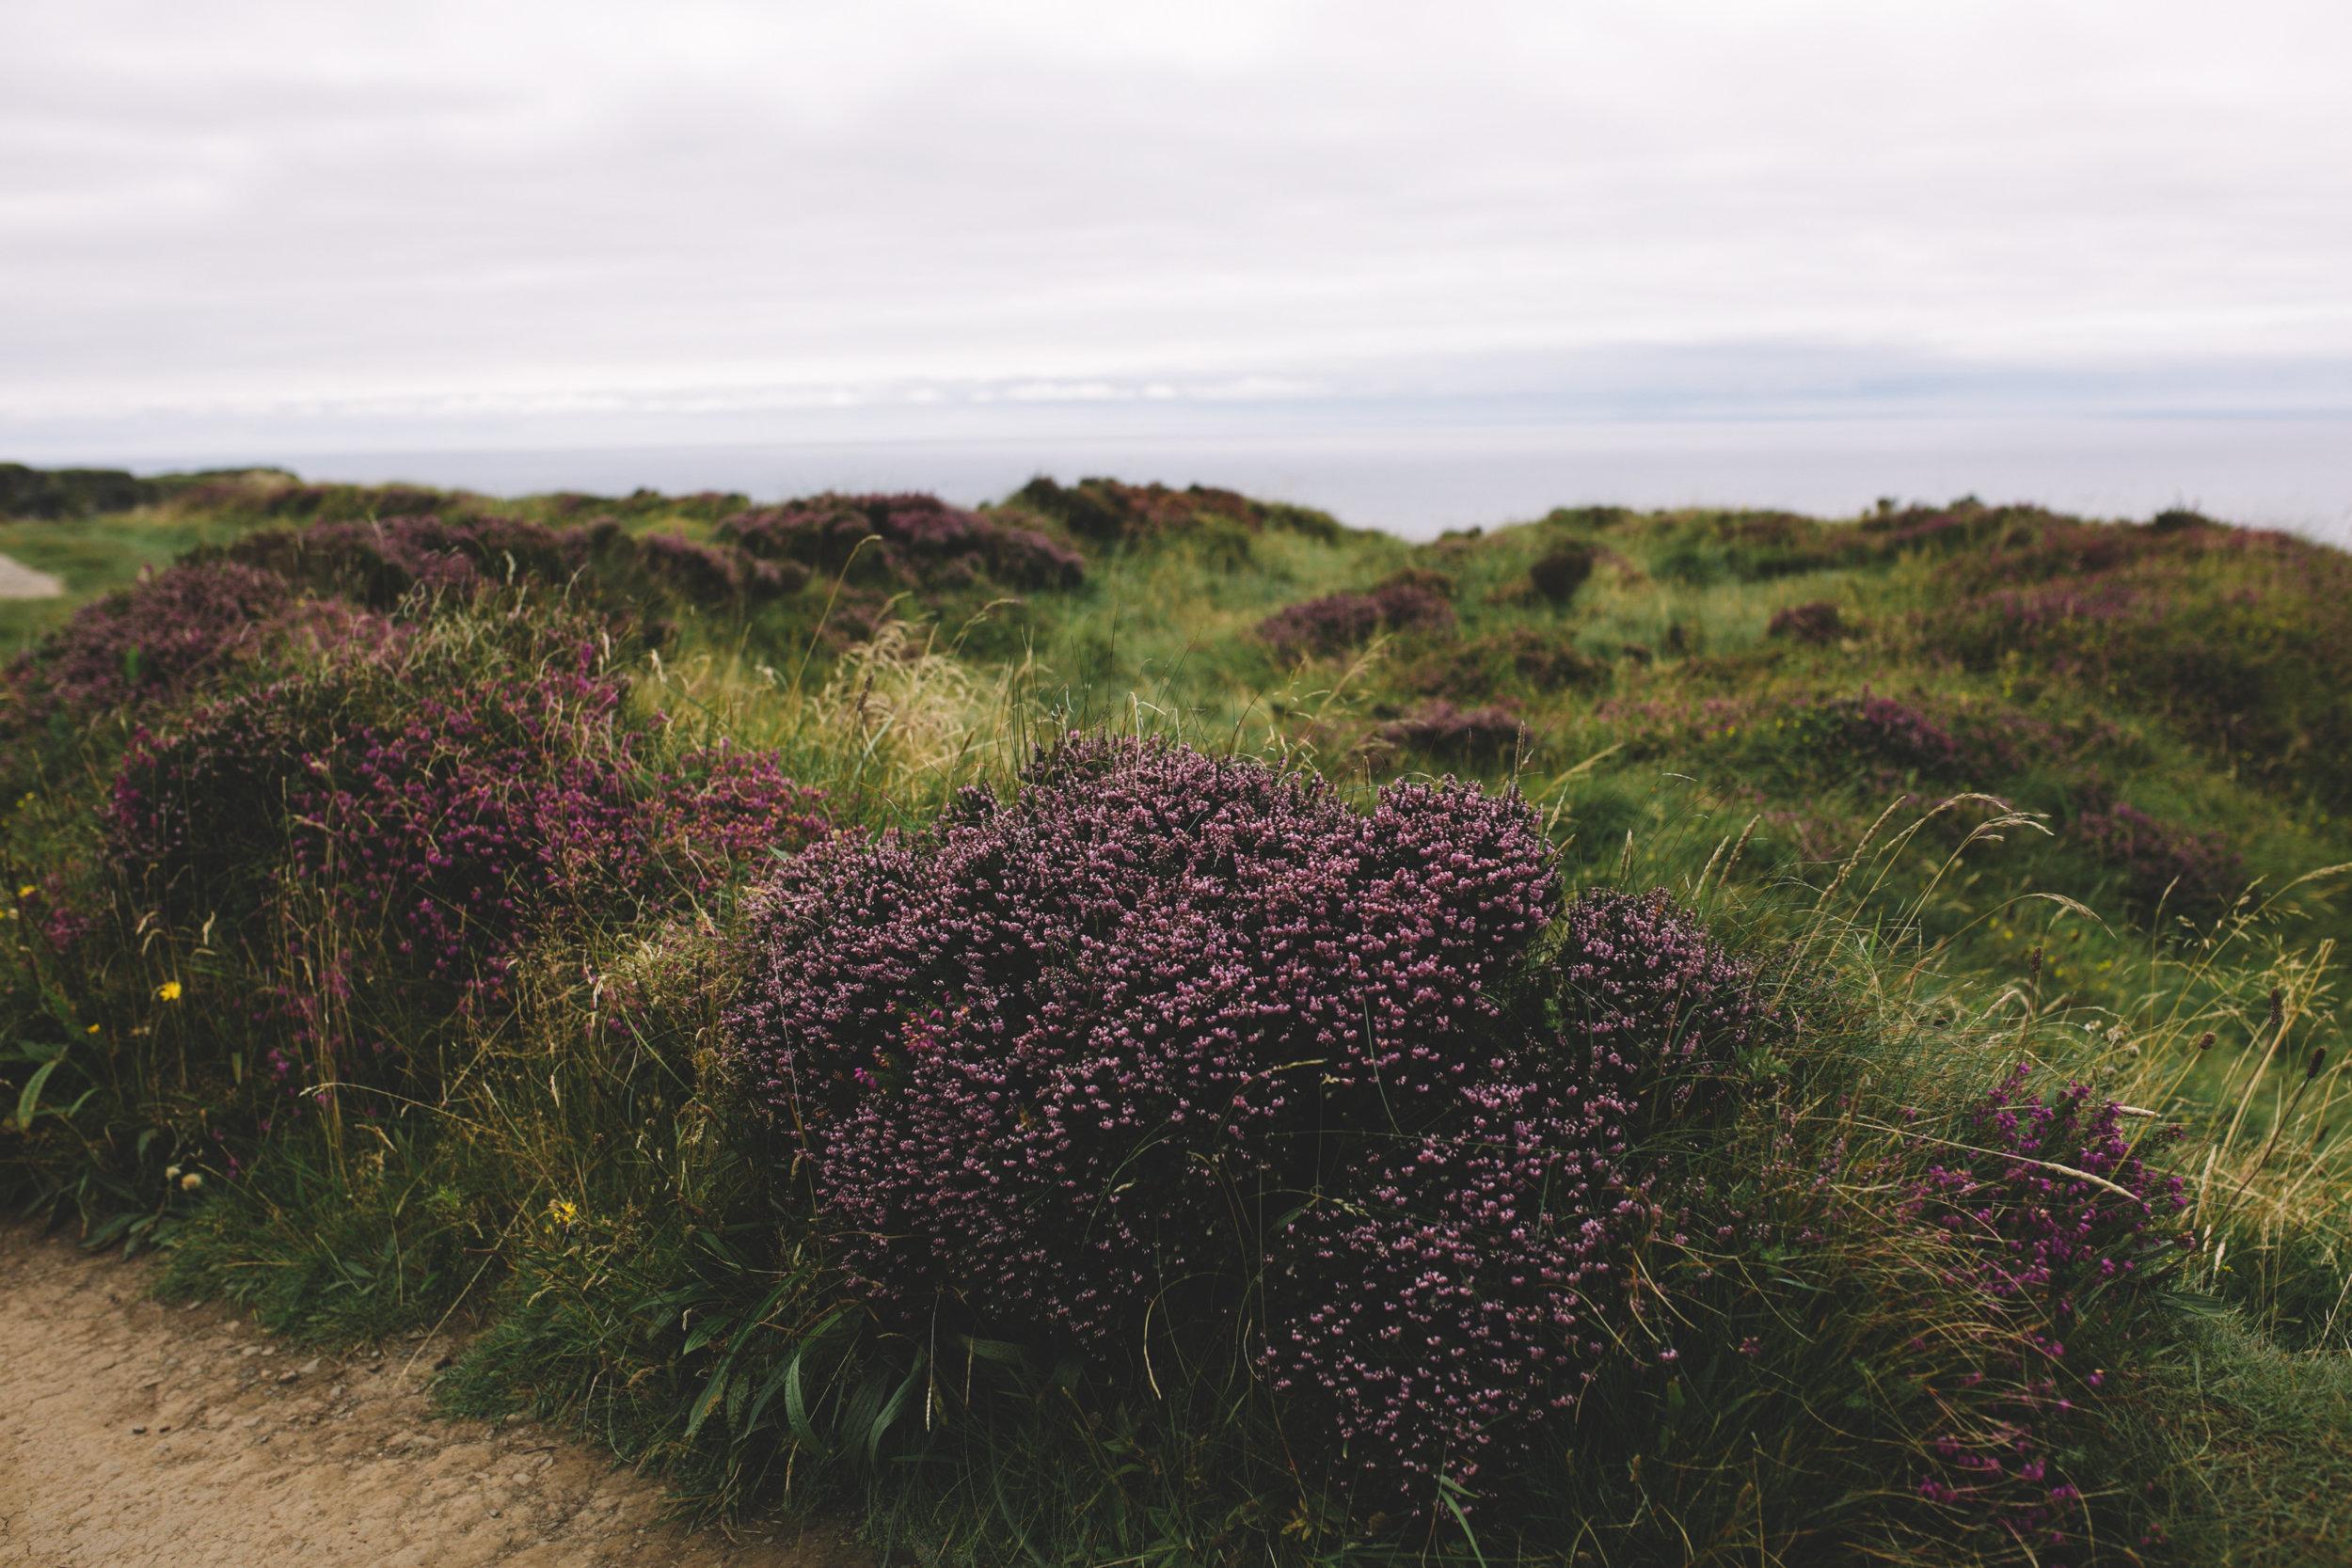 10 Tear Anniversary Trip - Aran Island Inis Orr Cliffs of Moher  (92 of 96).jpg